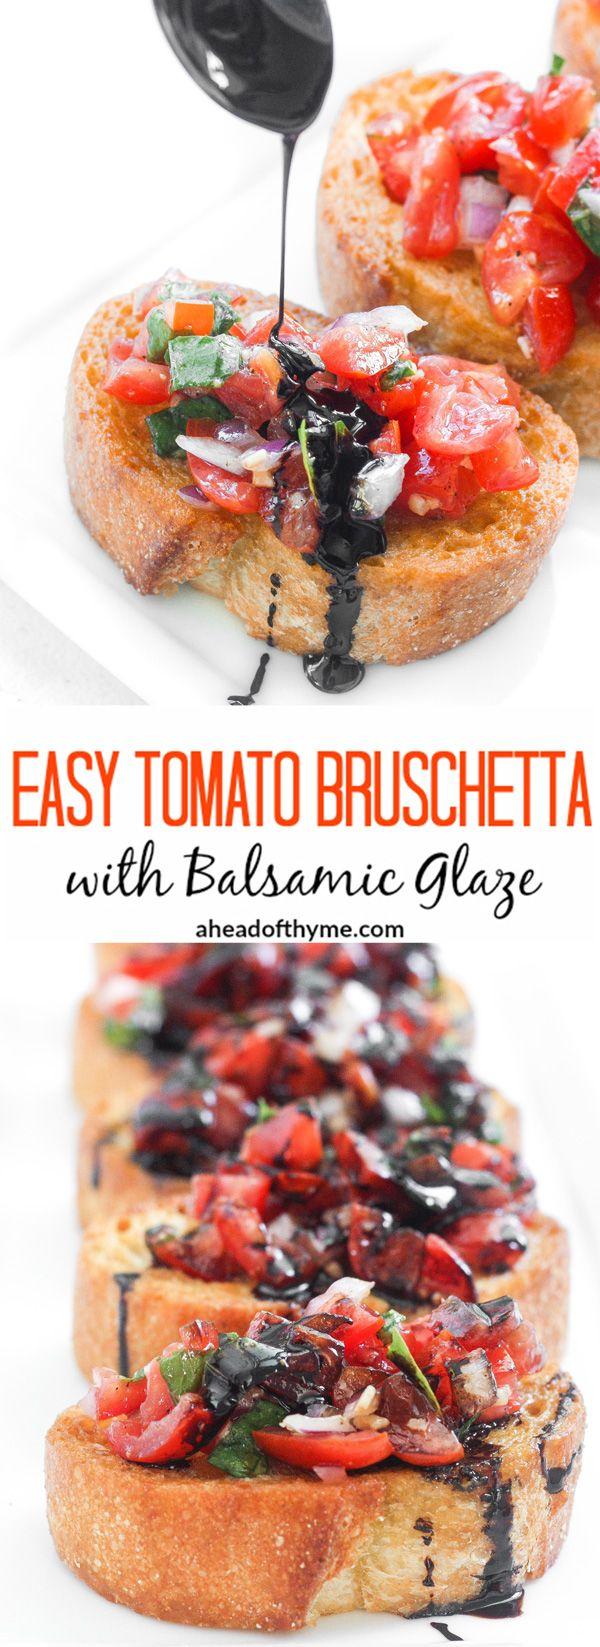 Photo of Easy Tomato Bruschetta with Balsamic Glaze